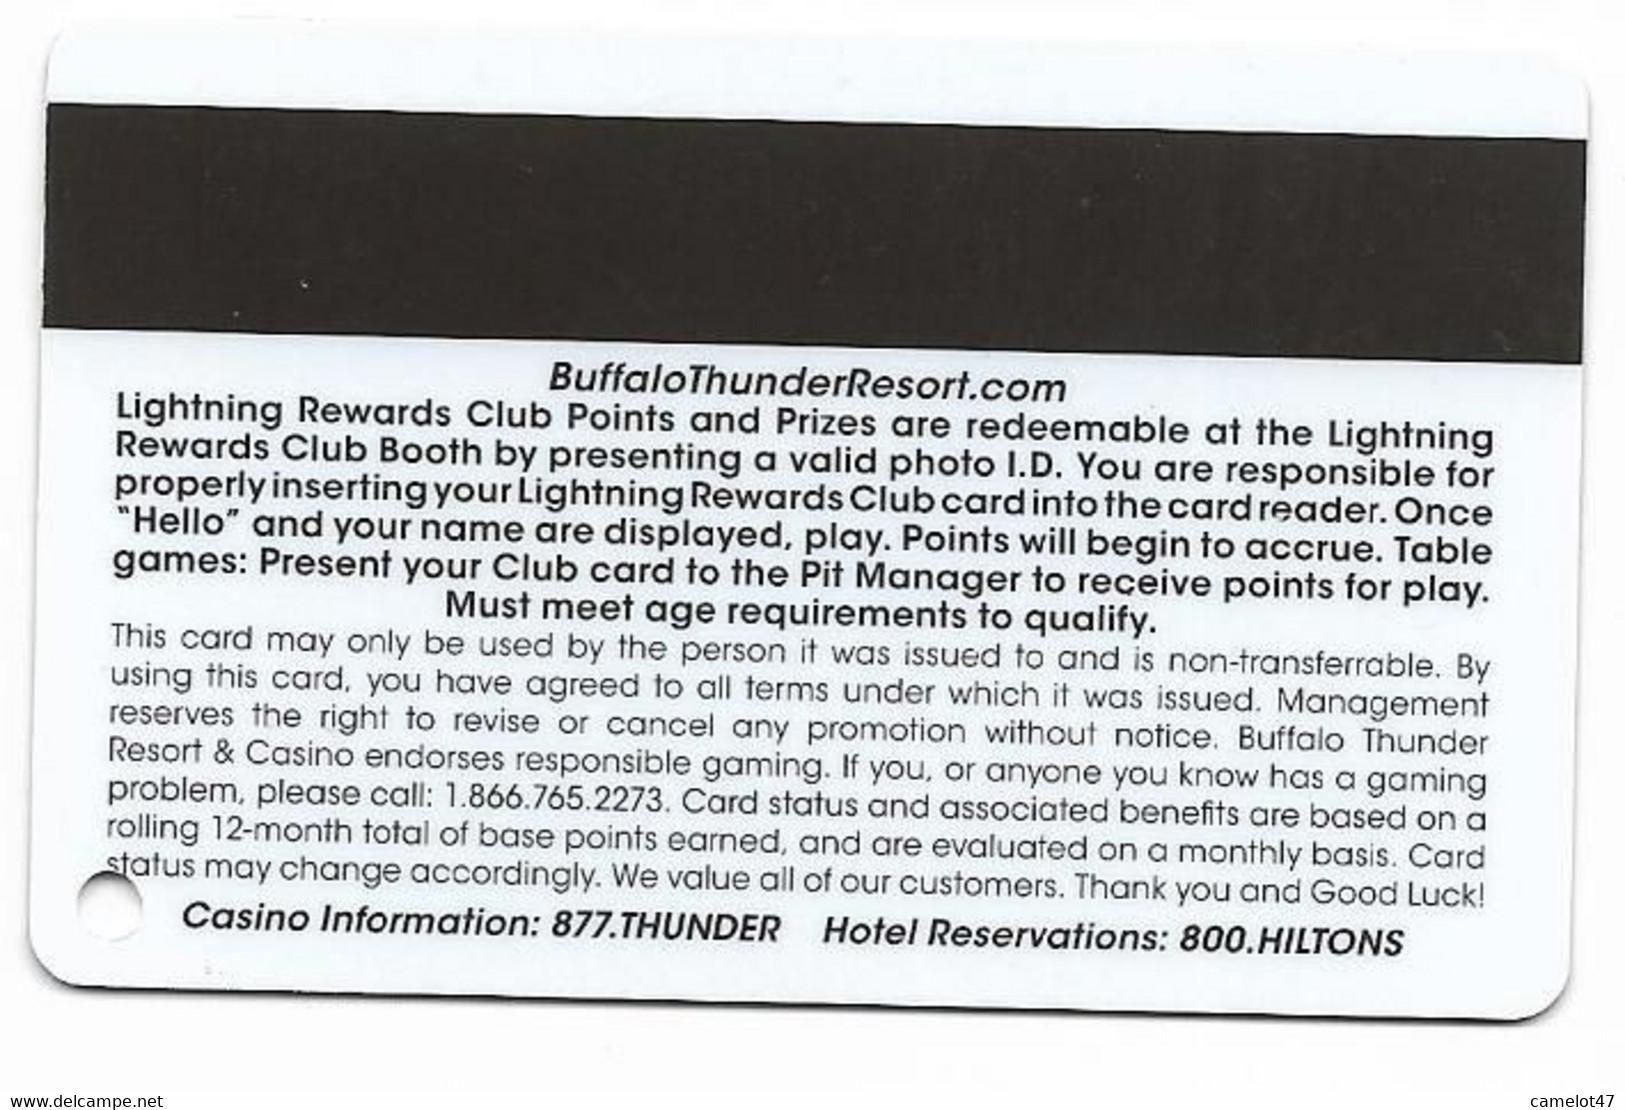 Buffalo Thunder Resort & Casino, Santa Fe, NM,  U.S.A., Older Used Slot Or Player's Card, # Buffalothunder-1 - Casino Cards